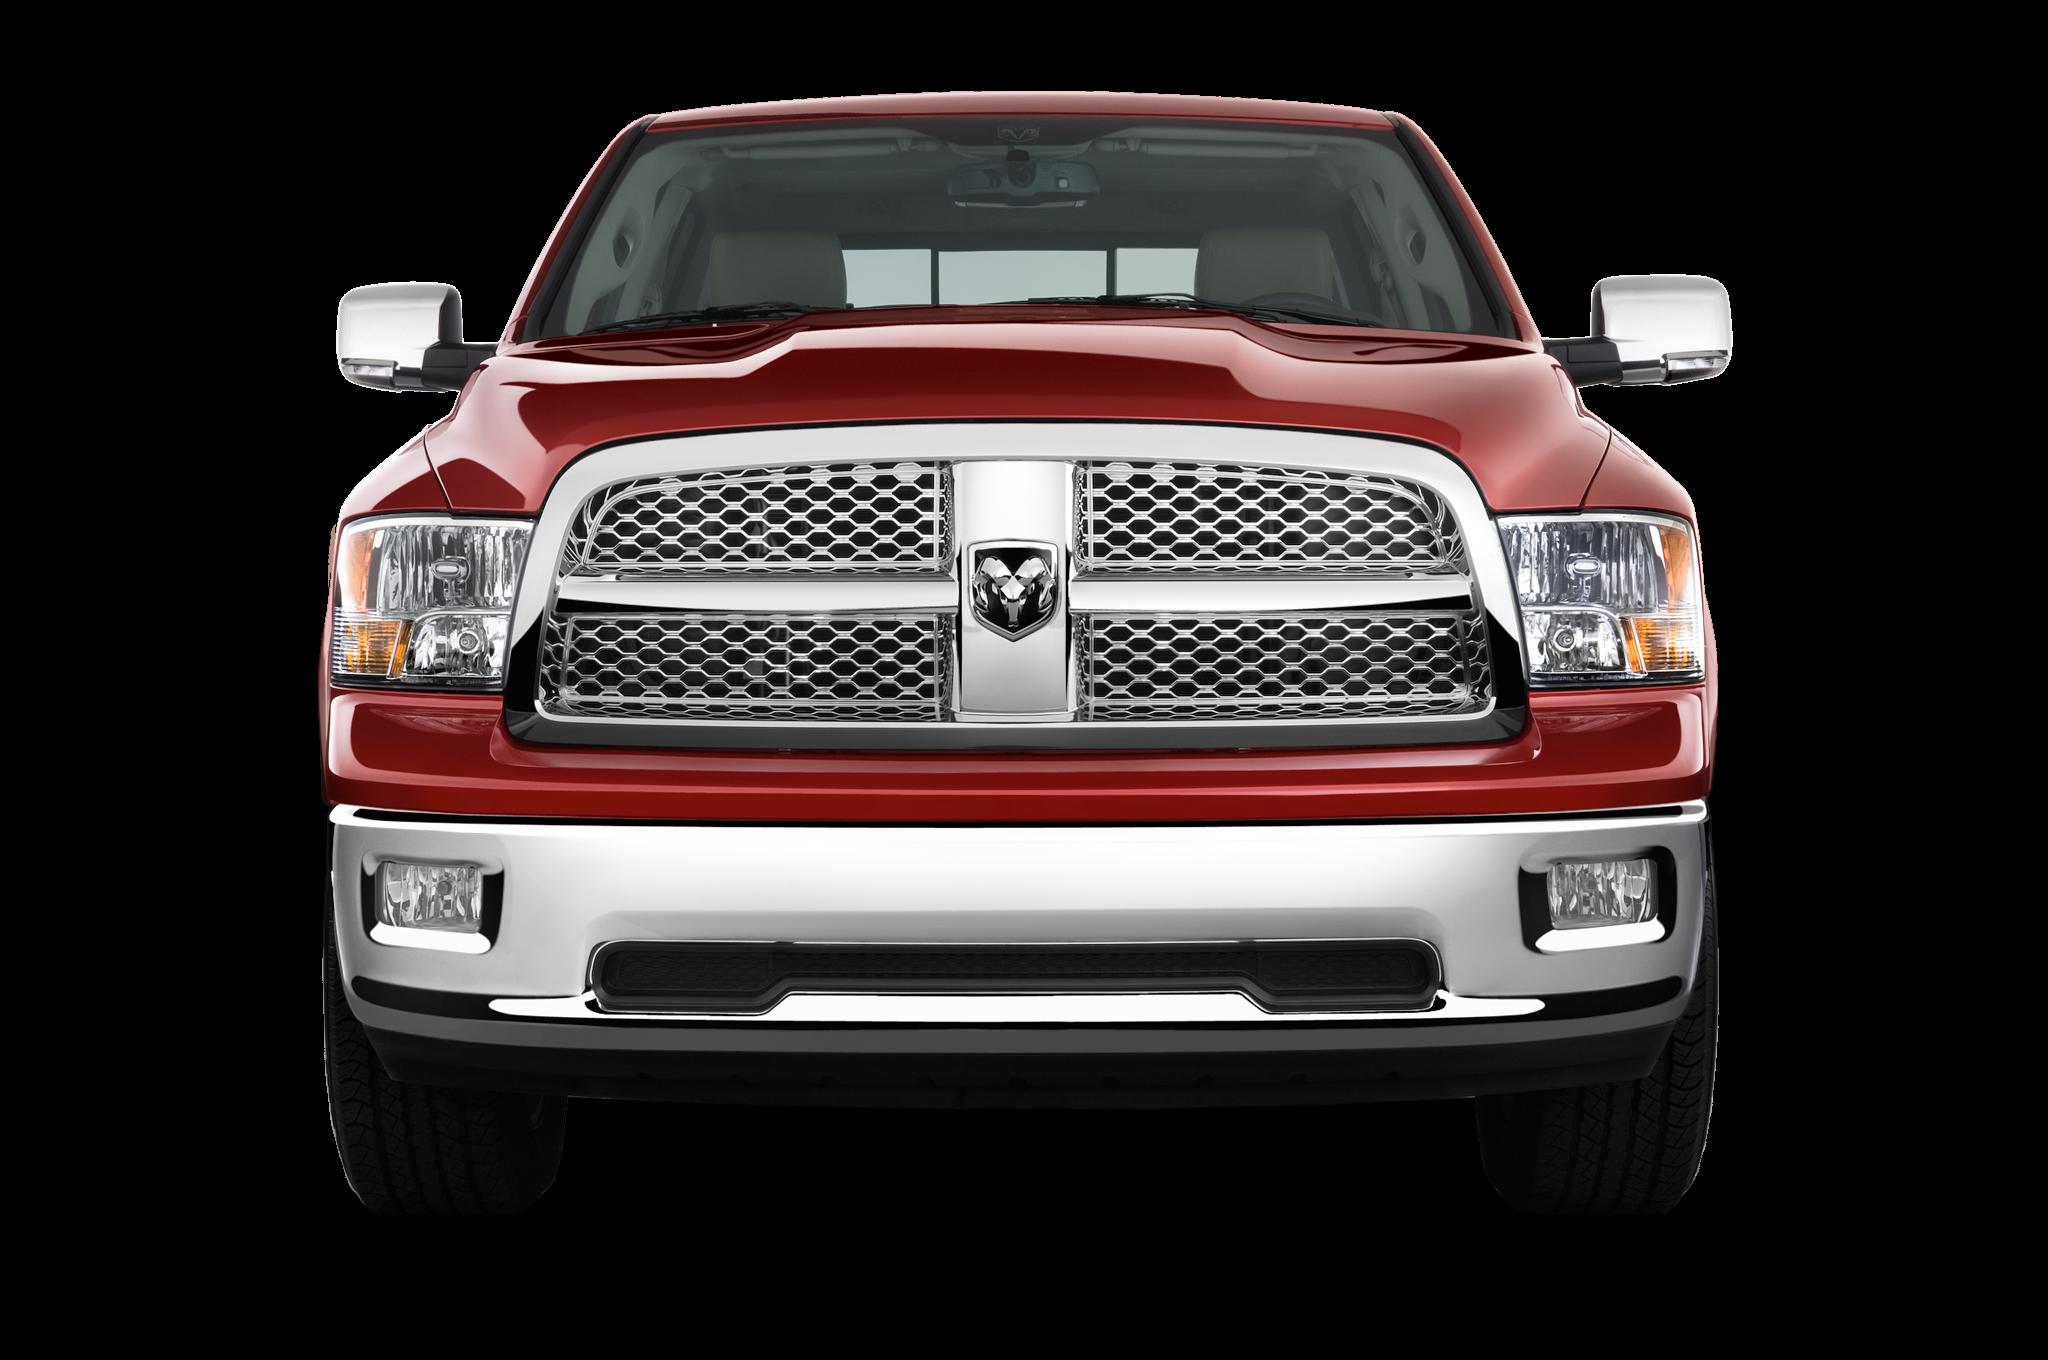 Dodge Ram 1500 Pickup Express Quad Cab 2012 International Price Prices Specs